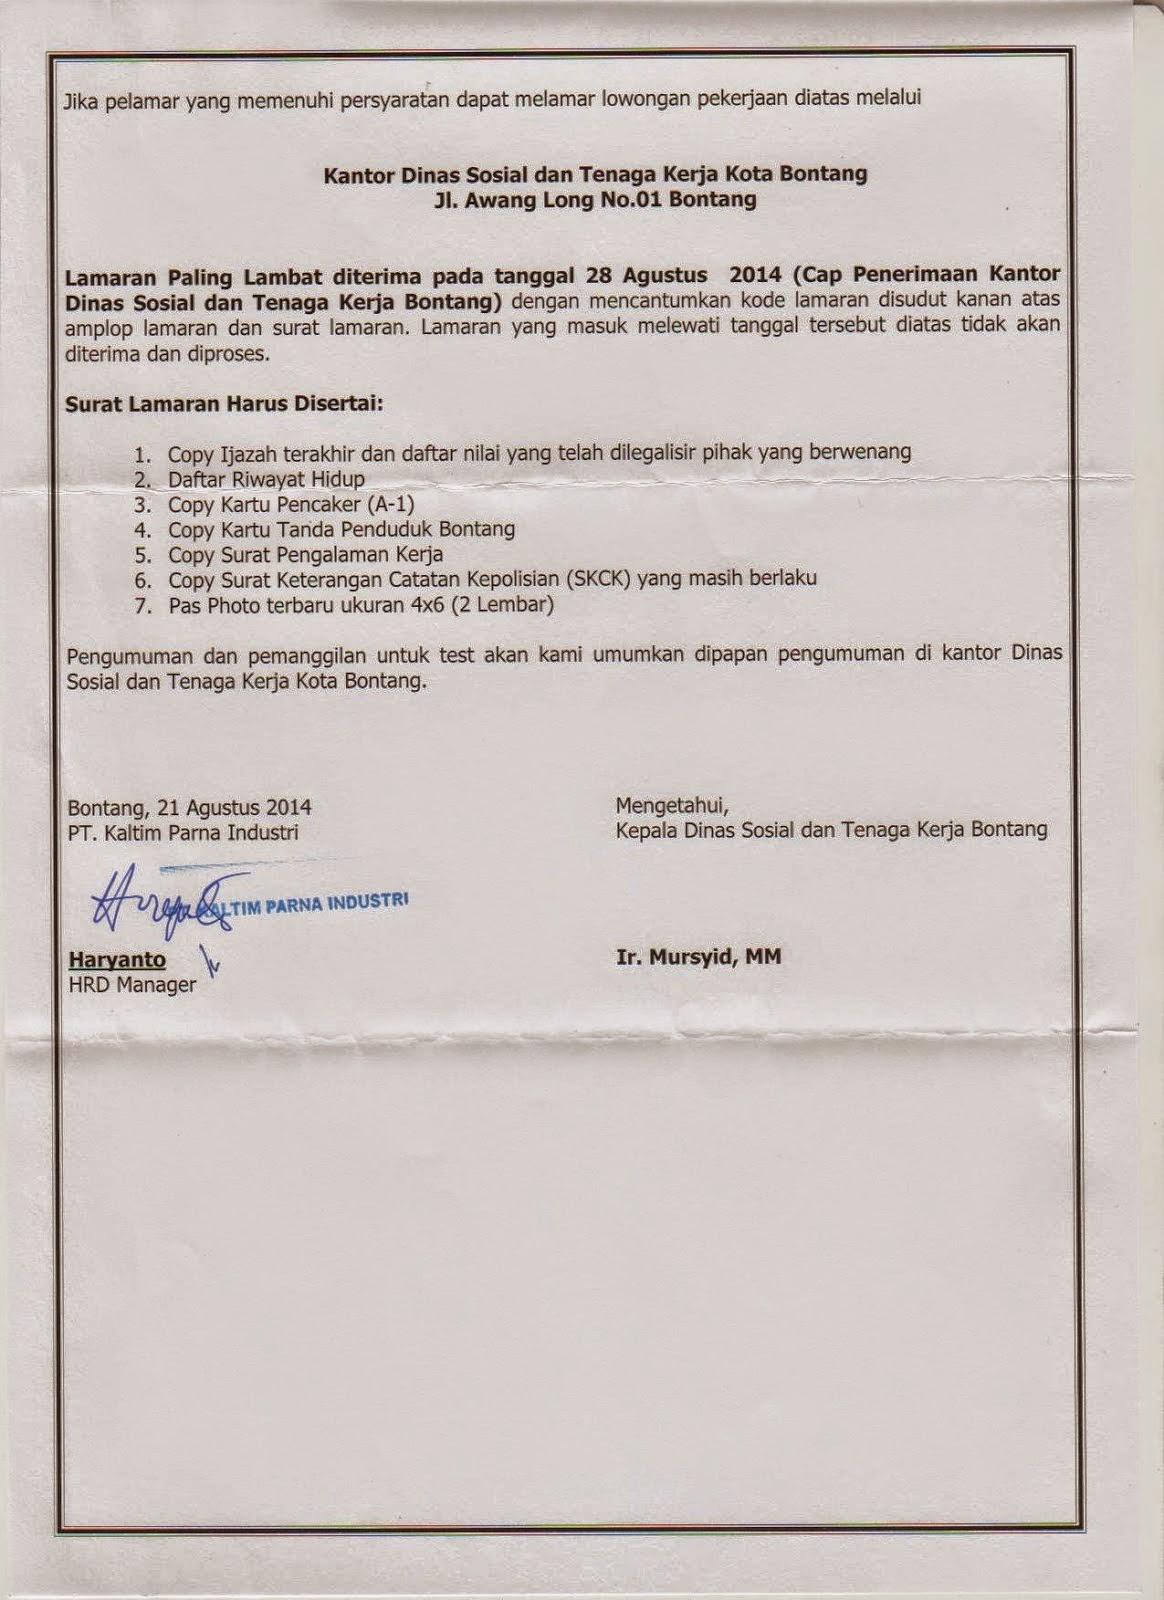 Lowongan Kerja Inspeksi Teknik PT Kaltim Parna Industri [ PT KPI ] Bontang Agustus 2014